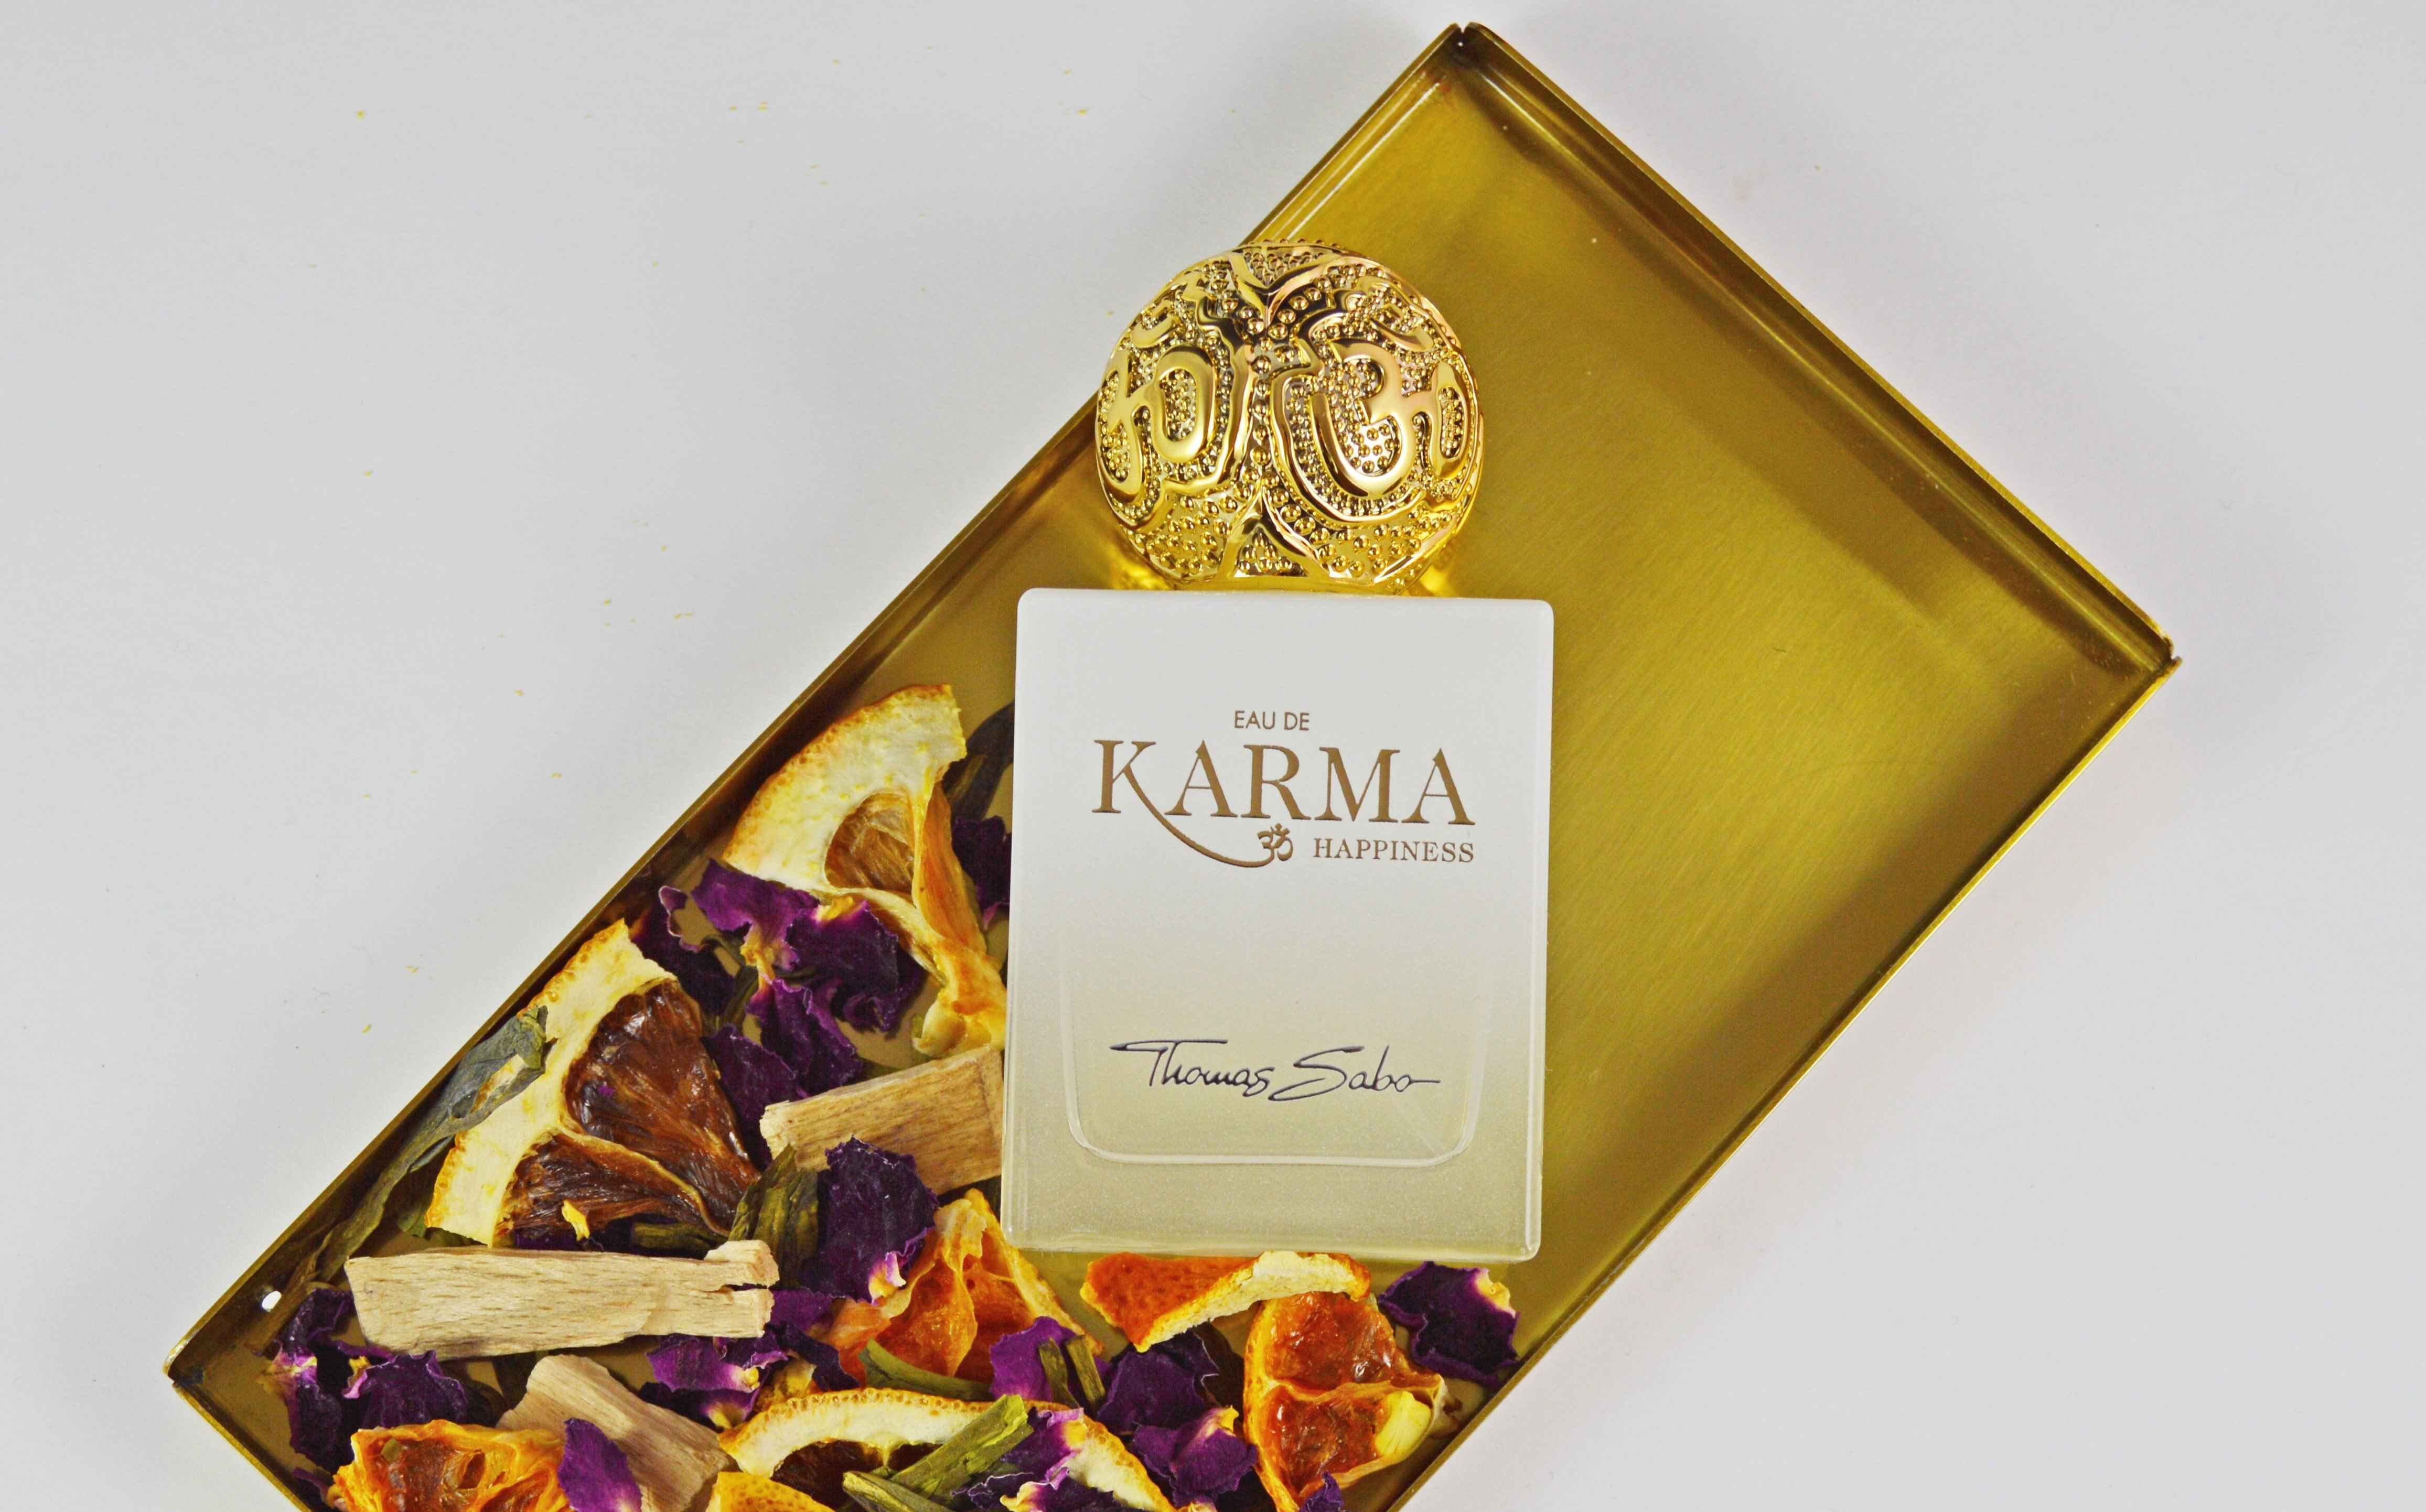 THOMAS SABO - Eau de Karma Happiness